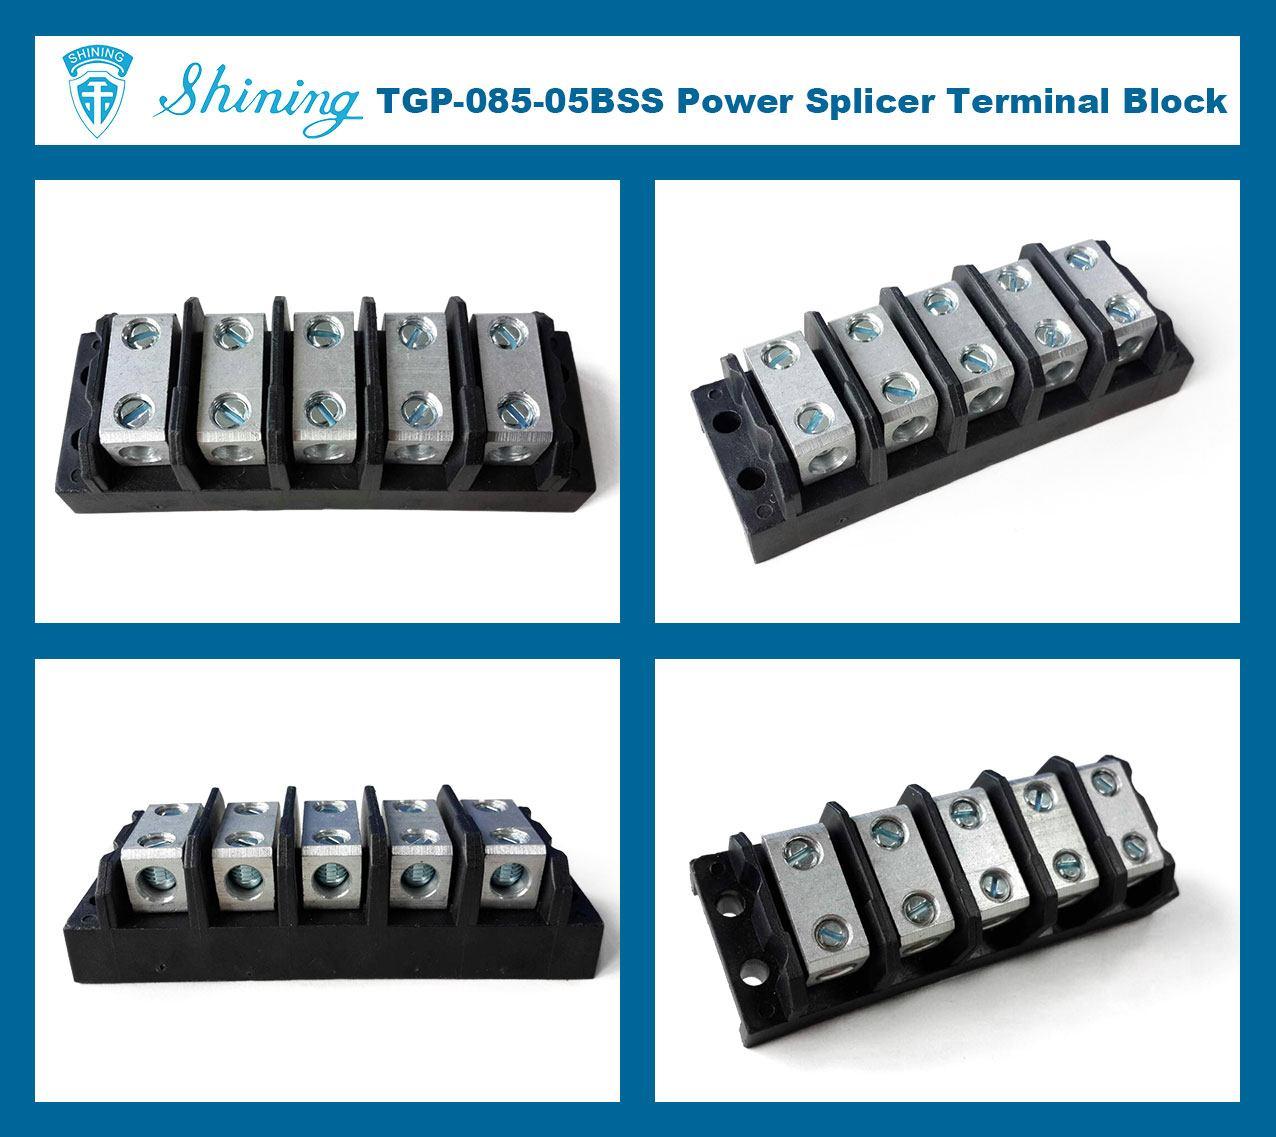 TGP-085-05BSS 600V 85A 5 Way Power Splicer Terminal Block